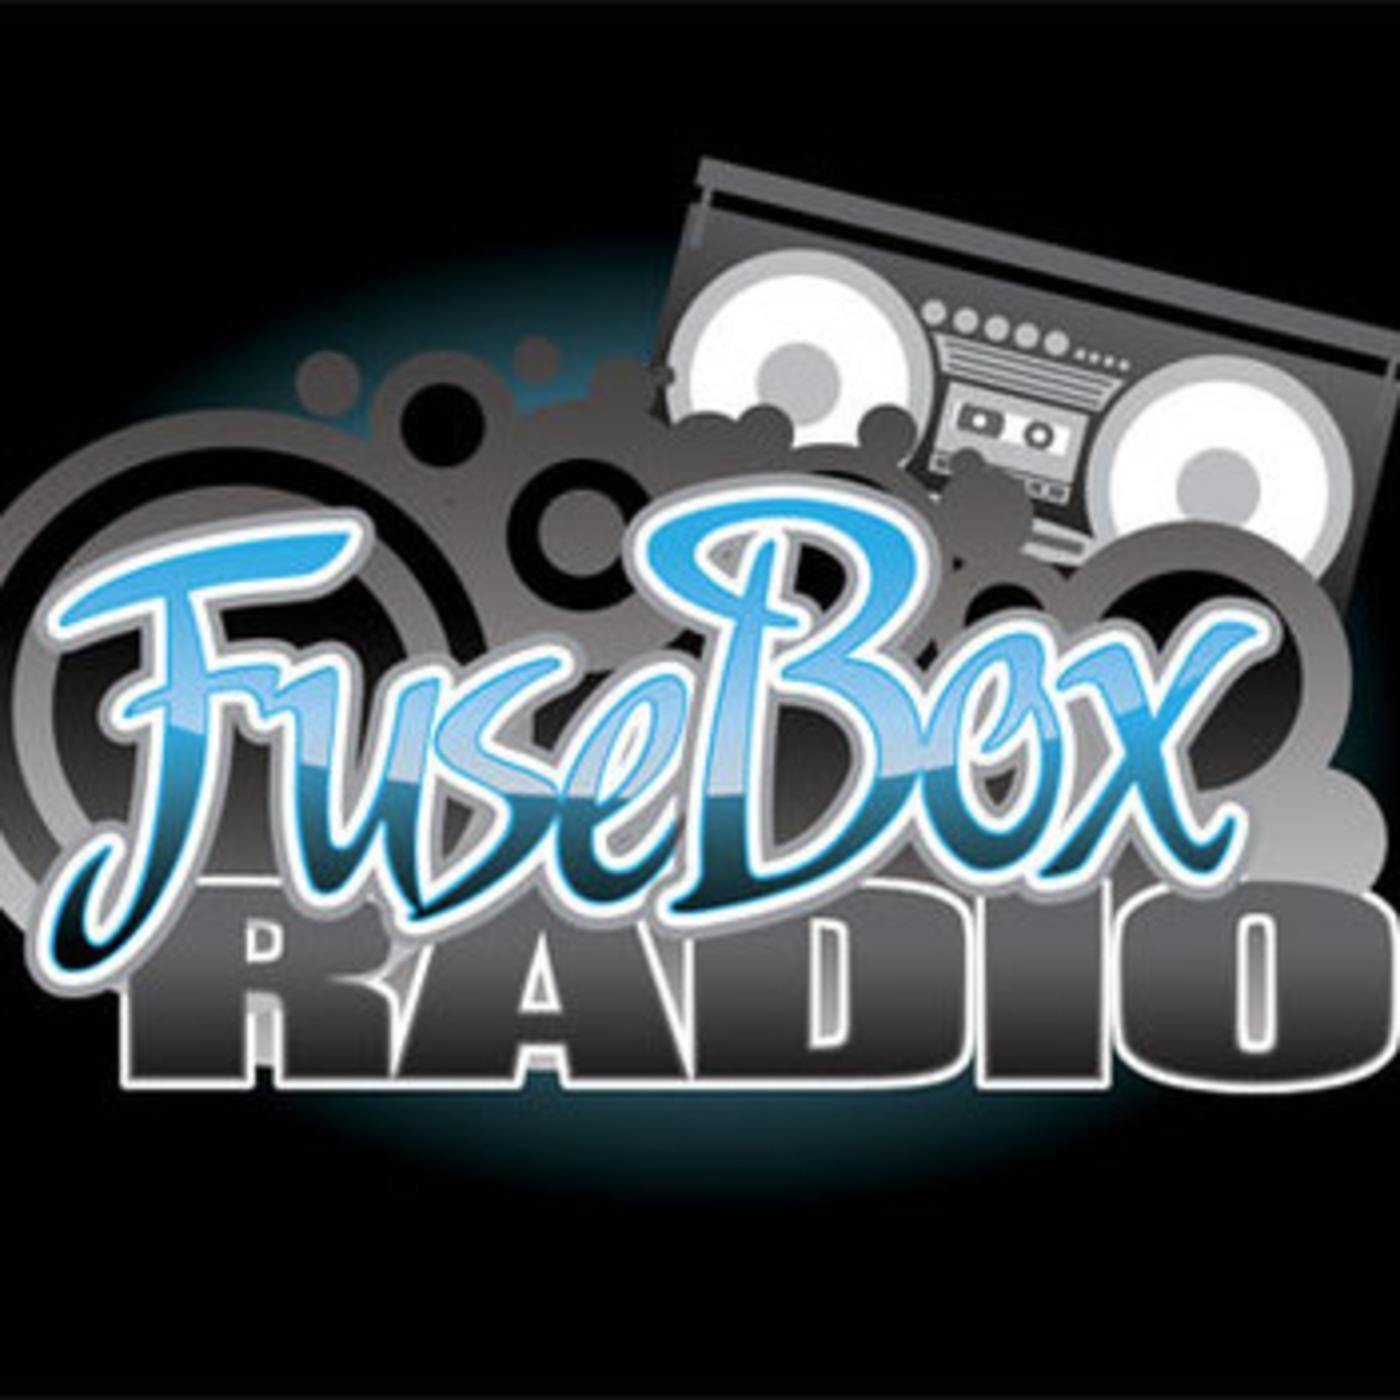 Fusebox Radio Broadcast W Dj Fusion Jon Judah 420 Weeks Of Jan Universal Fuse Box Itunes Pic